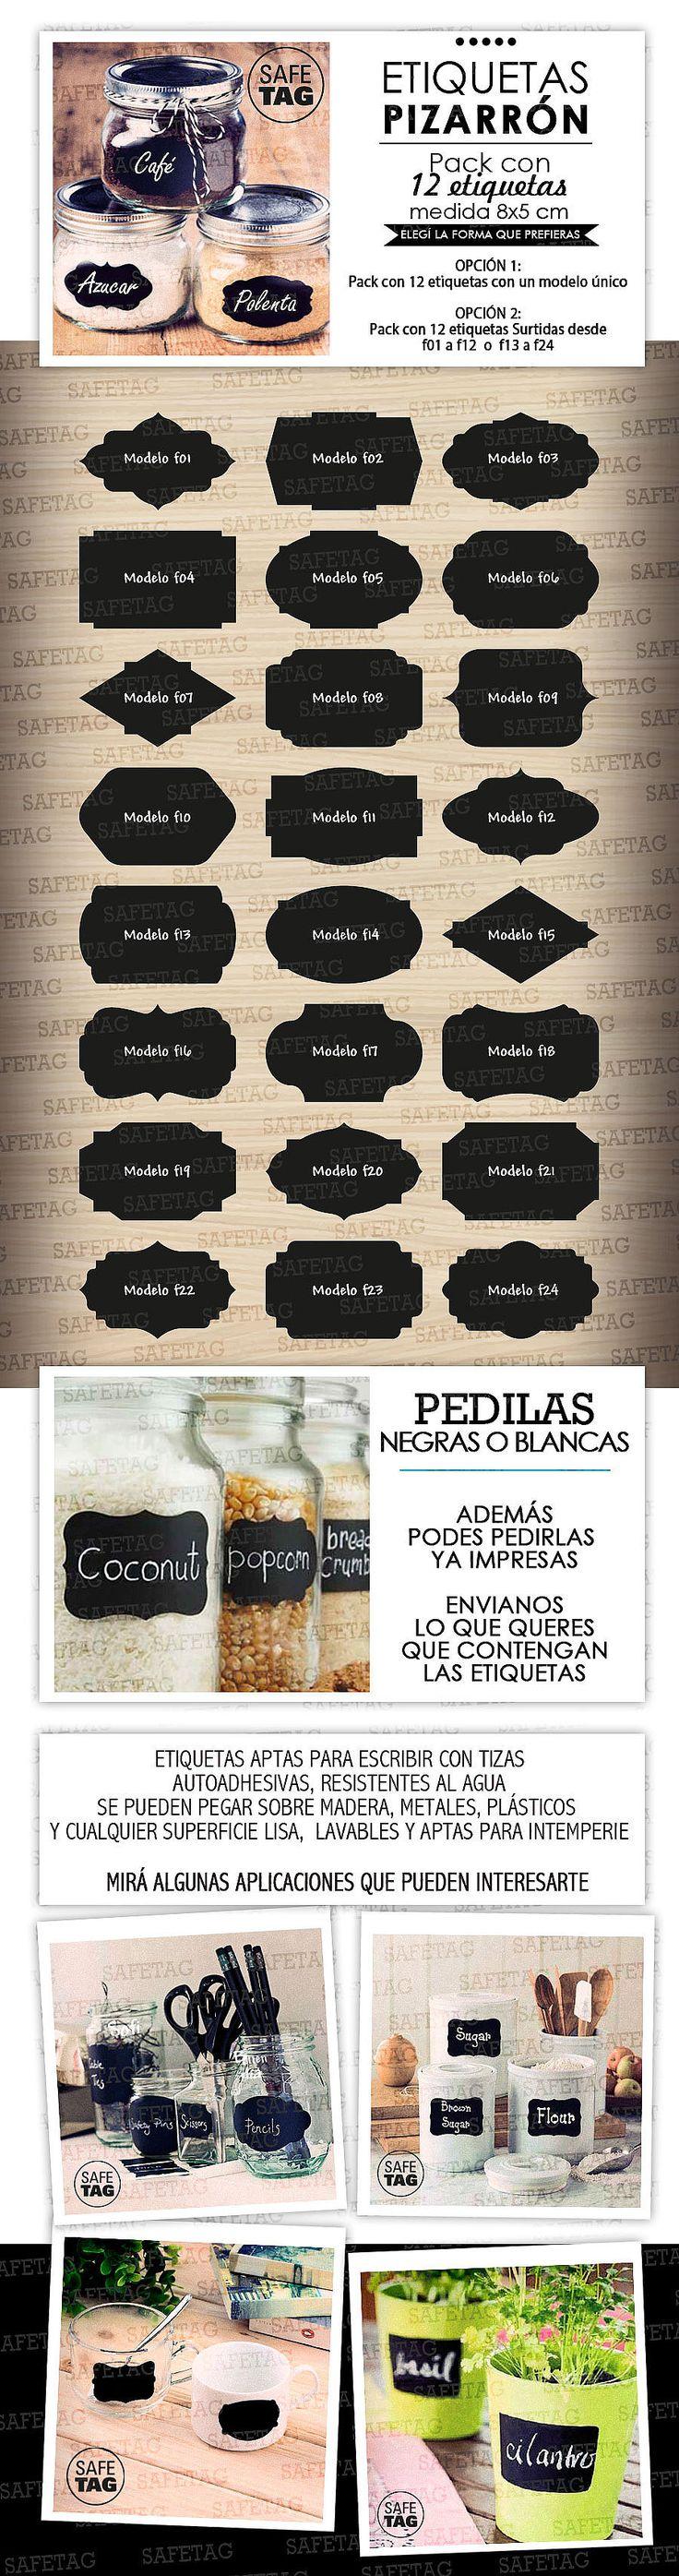 Etiquetas Autoadhesivas Frases Frascos Vasos Botellas X 55 - $ 79,90